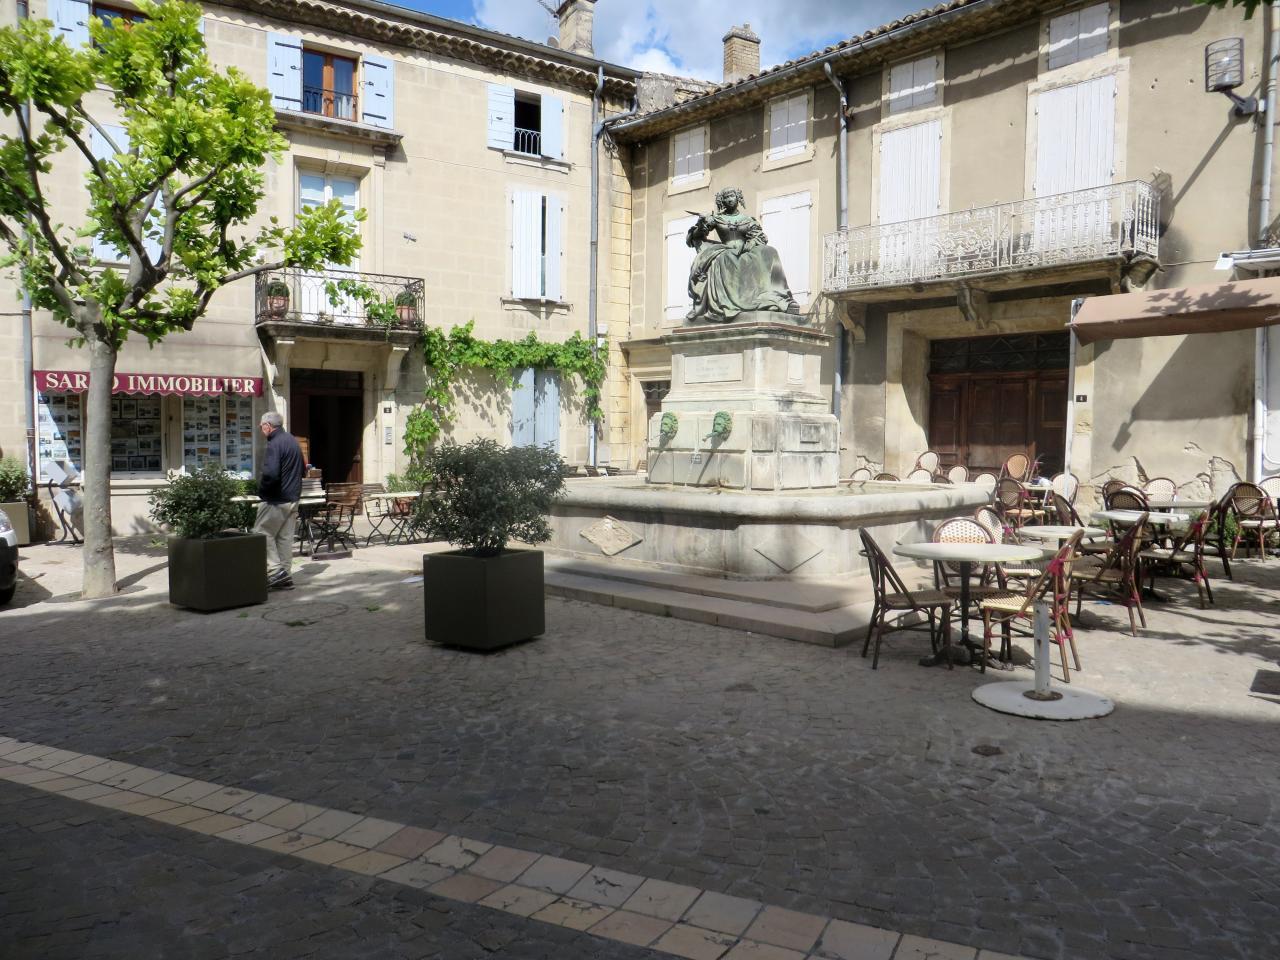 Grignan 6 - Caf salon de provence ...